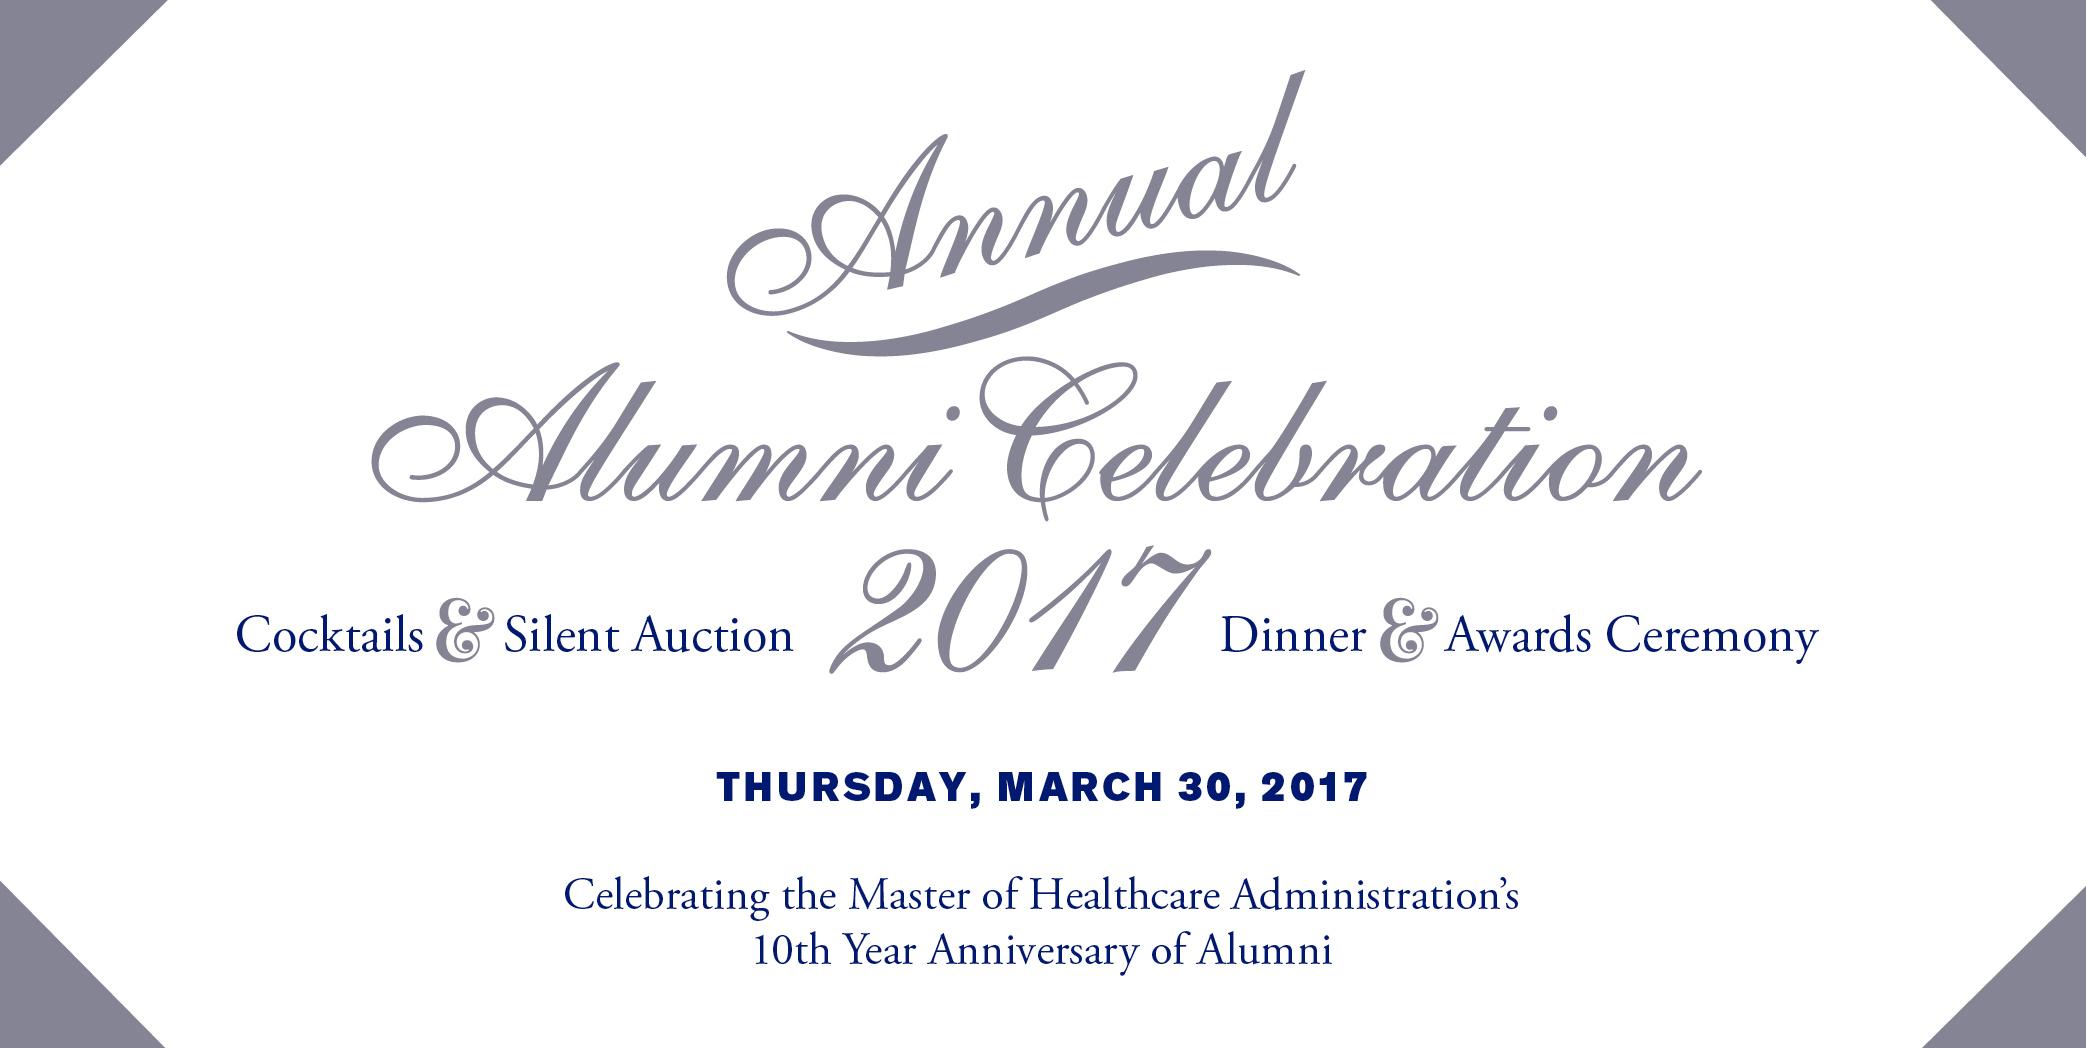 UIC School of Public Health Annual Alumni Celebration 2017